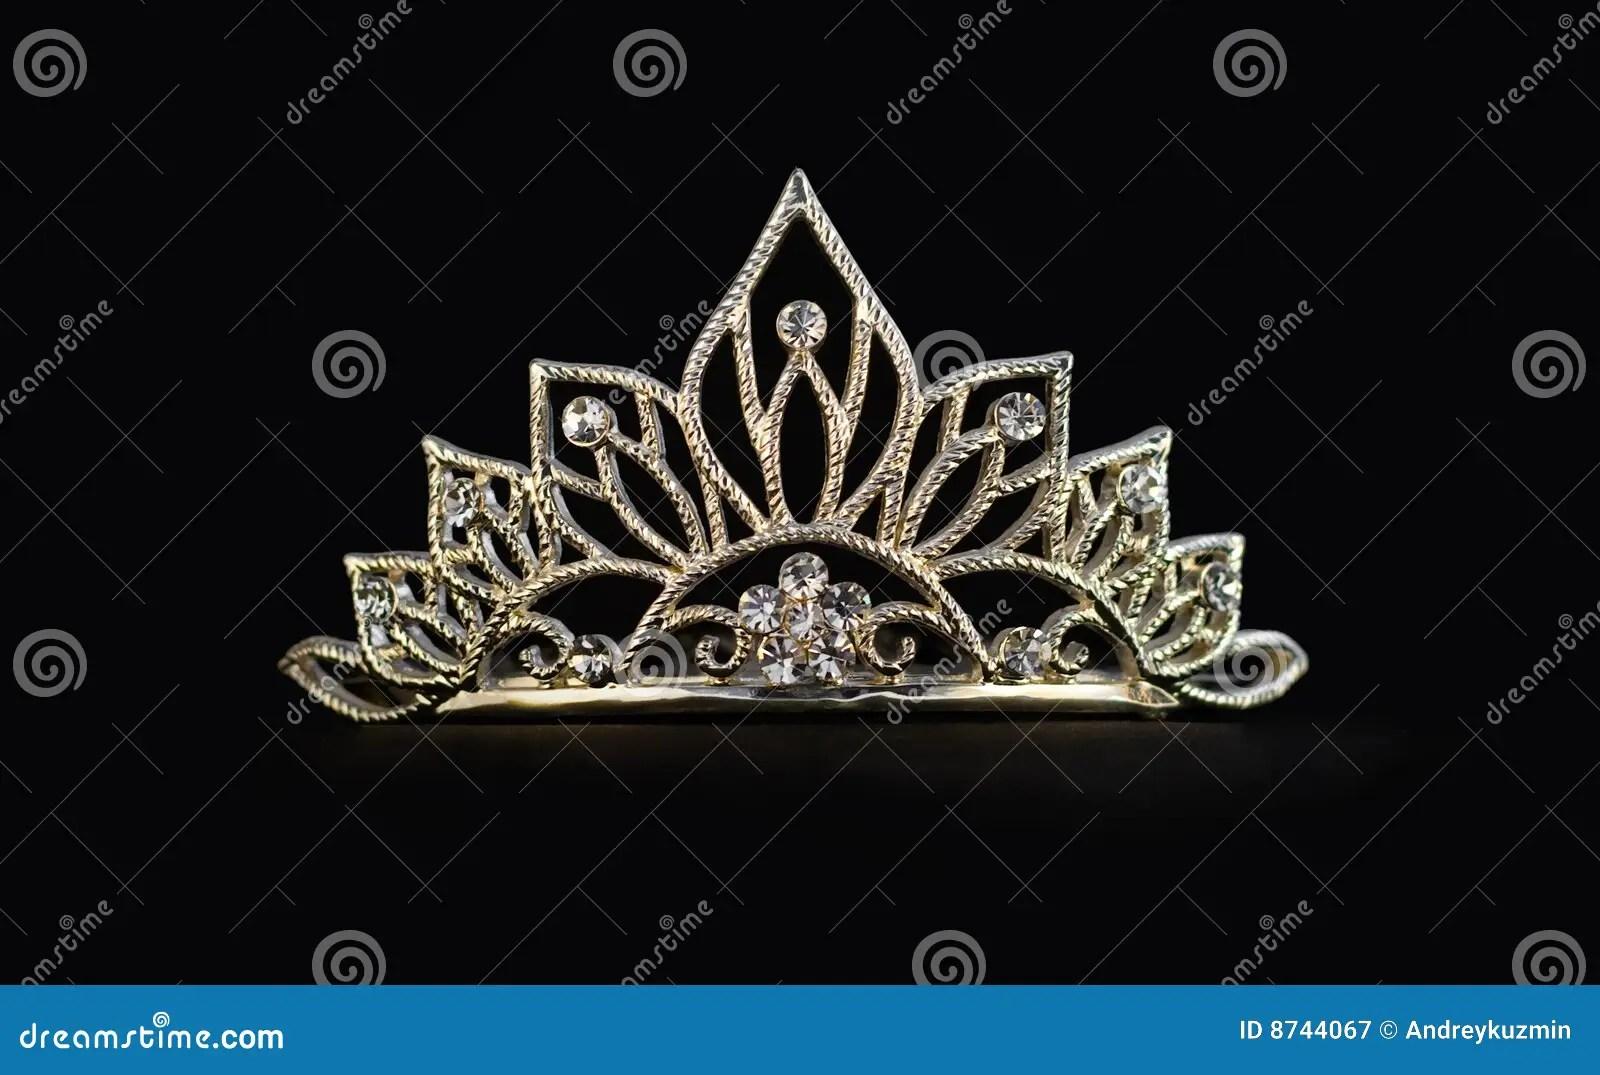 Tiara Or Diadem Or Crown On Black Stock Image - Image of platinum. universe: 8744067